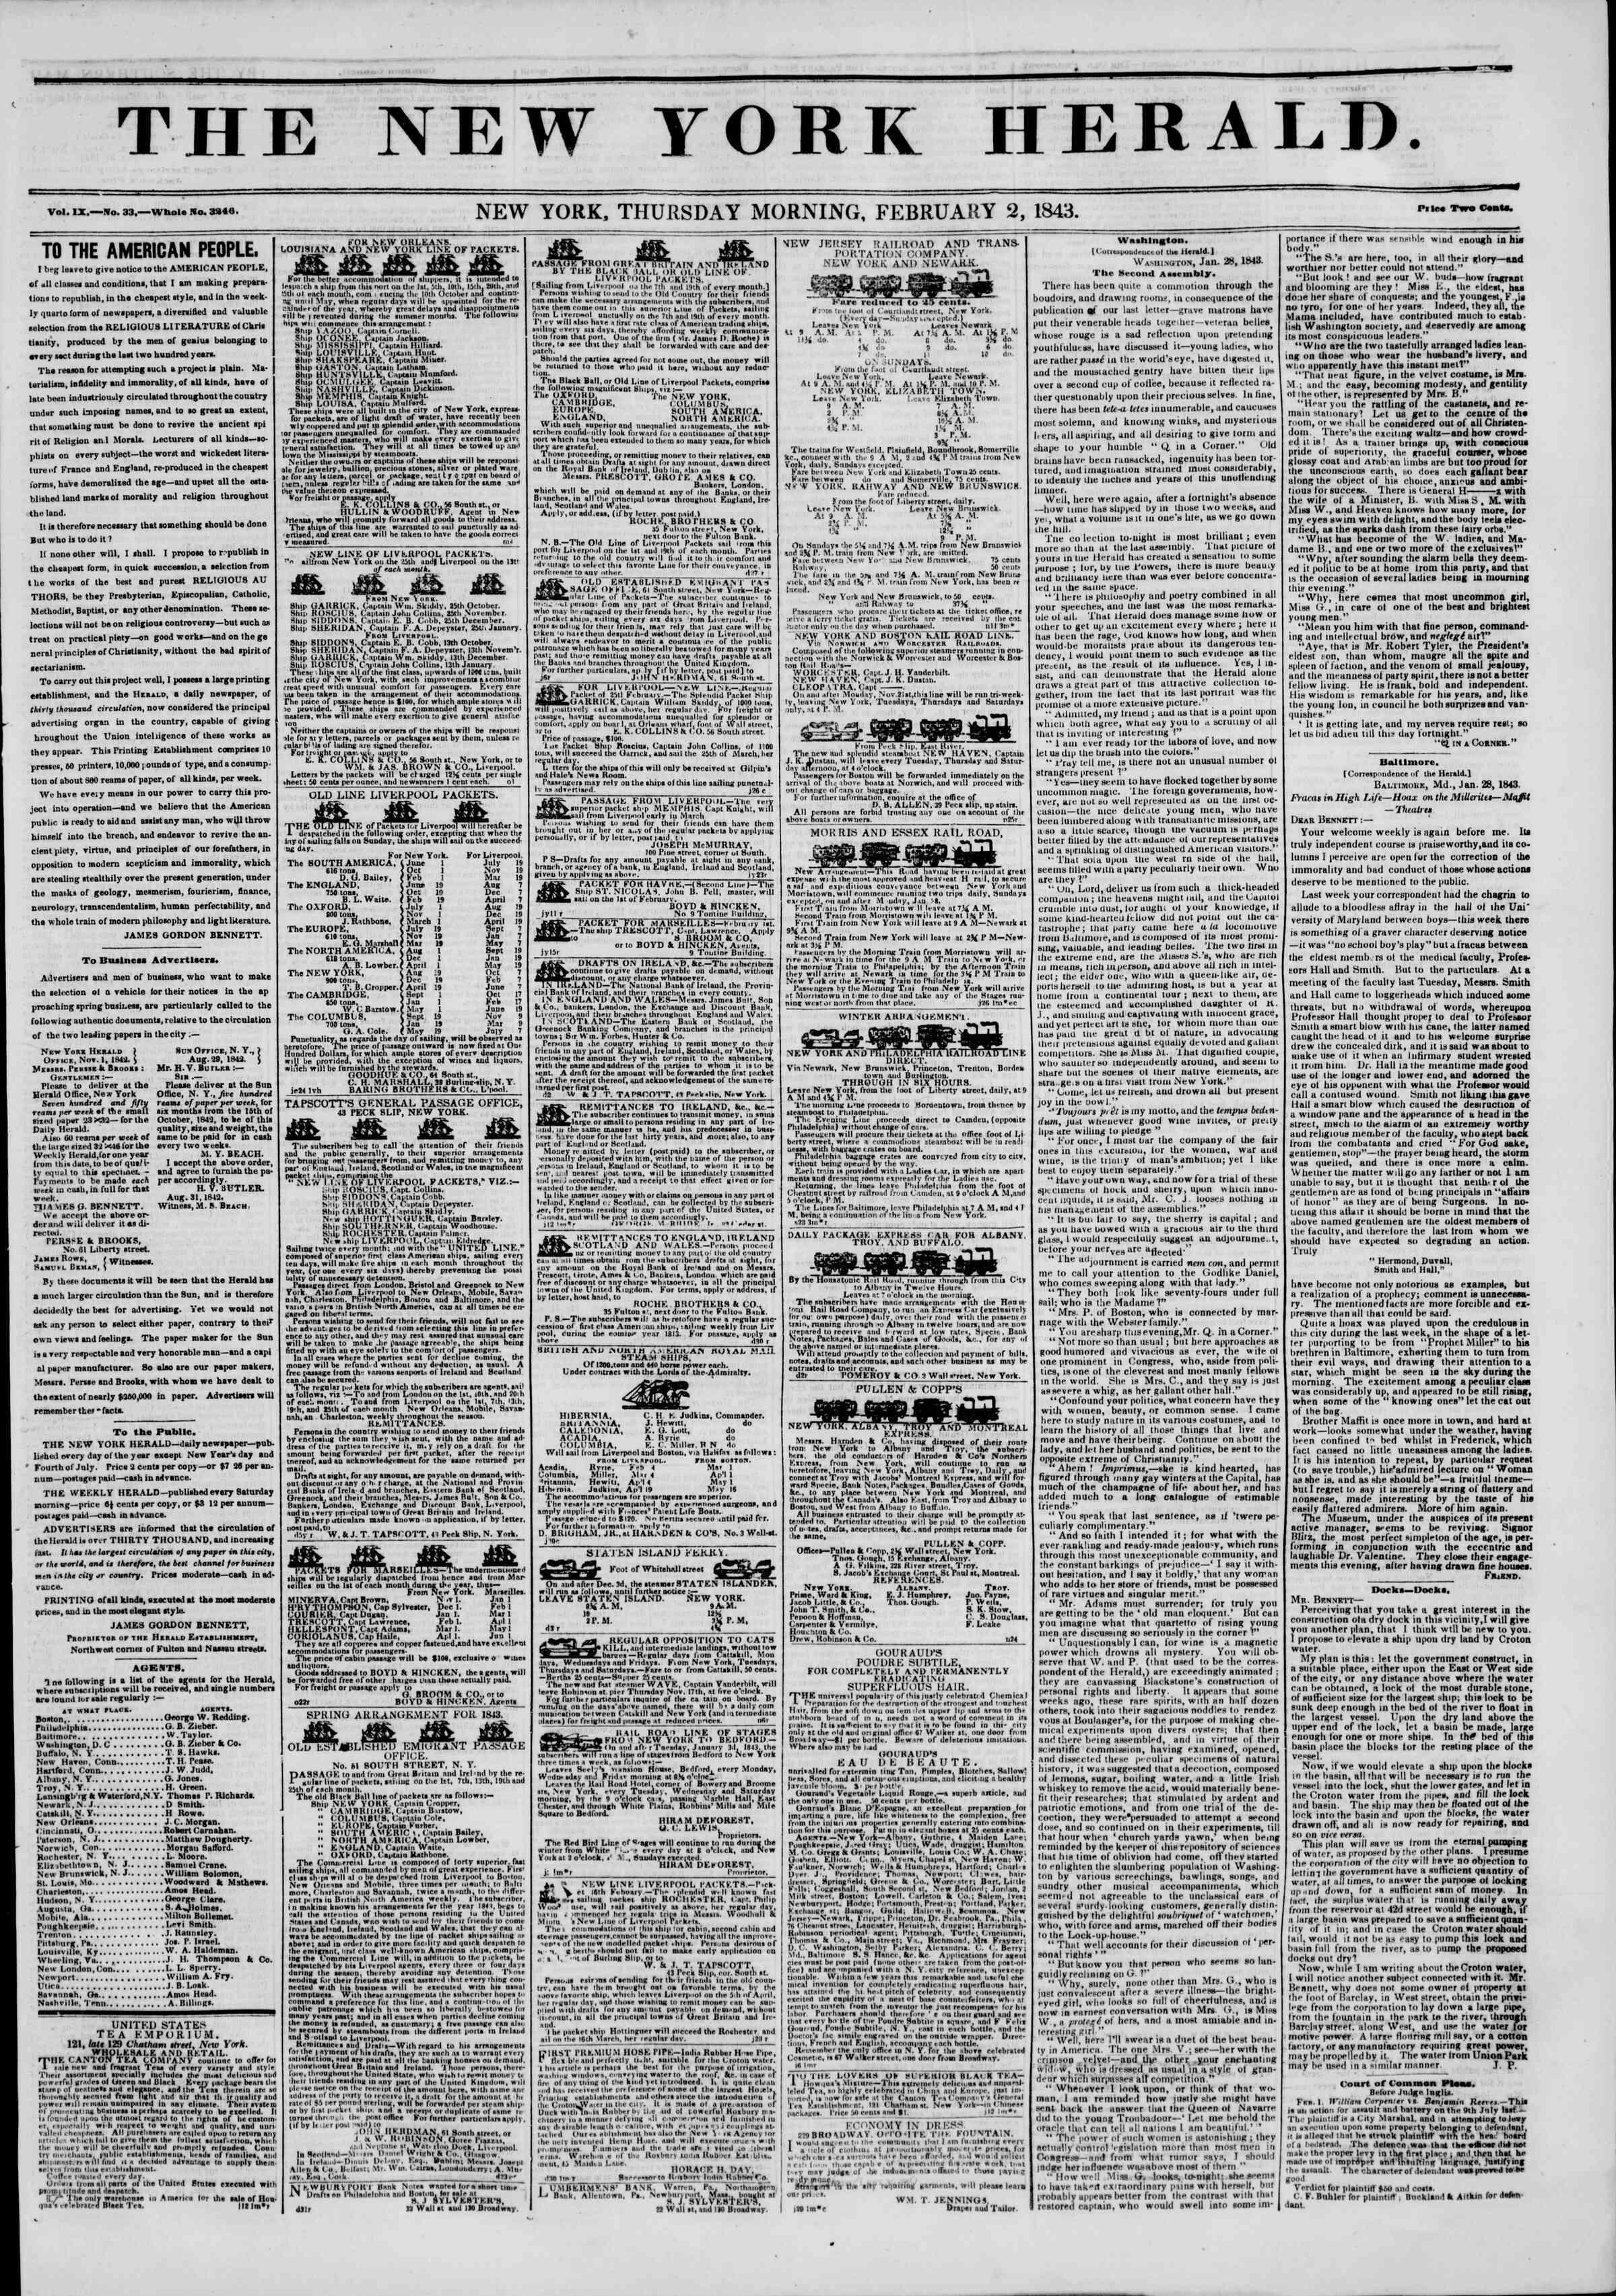 February 2, 1843 Tarihli The New York Herald Gazetesi Sayfa 1